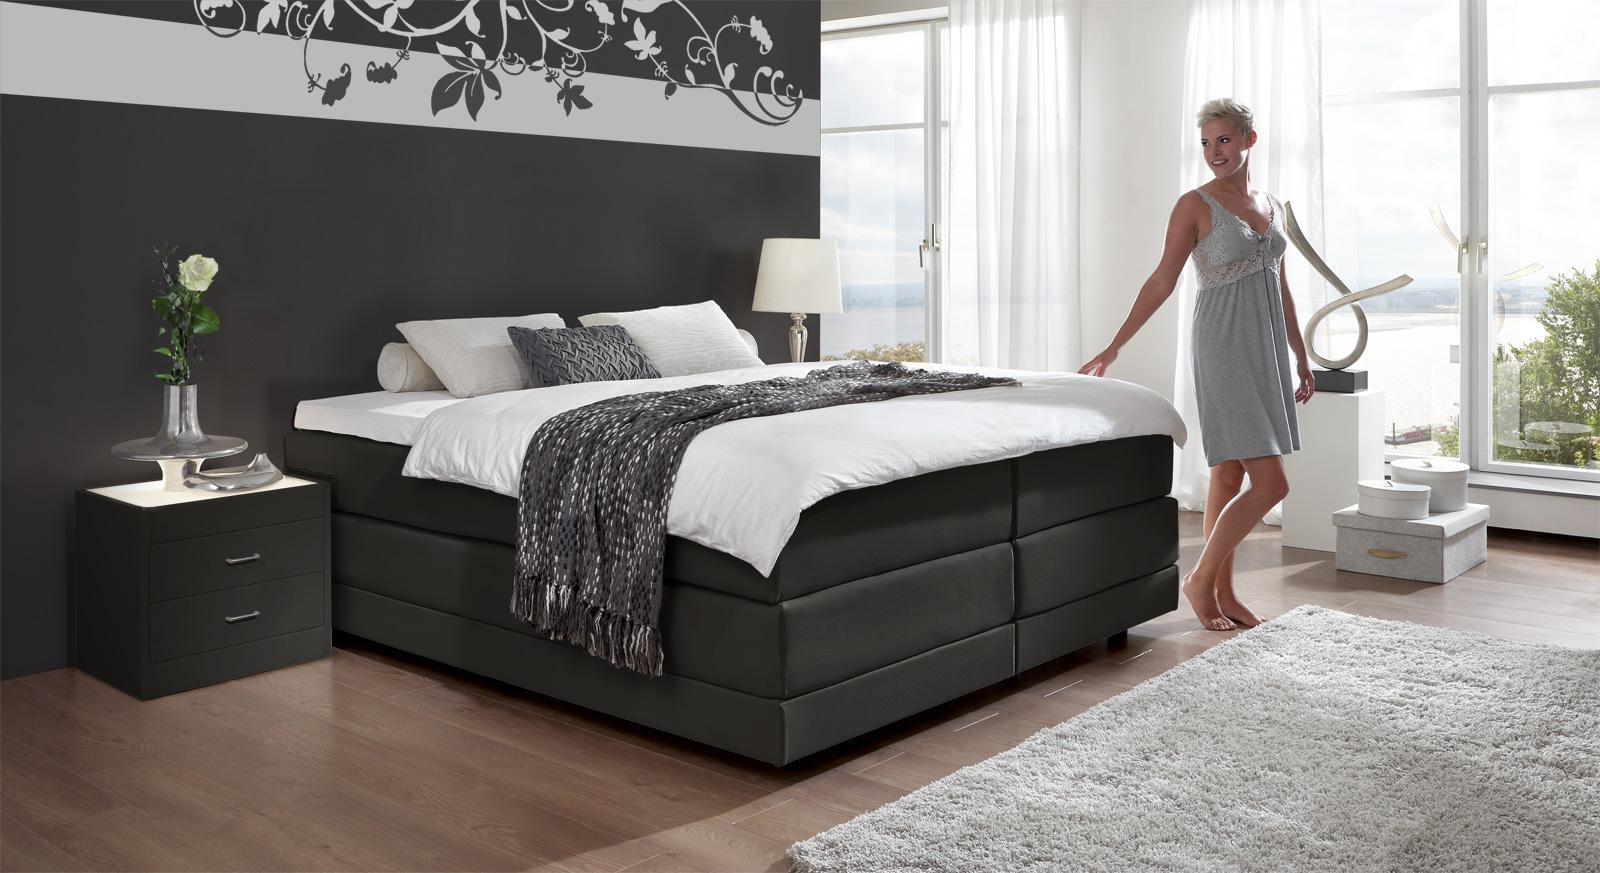 betten ohne kopfteil weis massivholzbett quot astrid ohne kopfteil cm betten. Black Bedroom Furniture Sets. Home Design Ideas